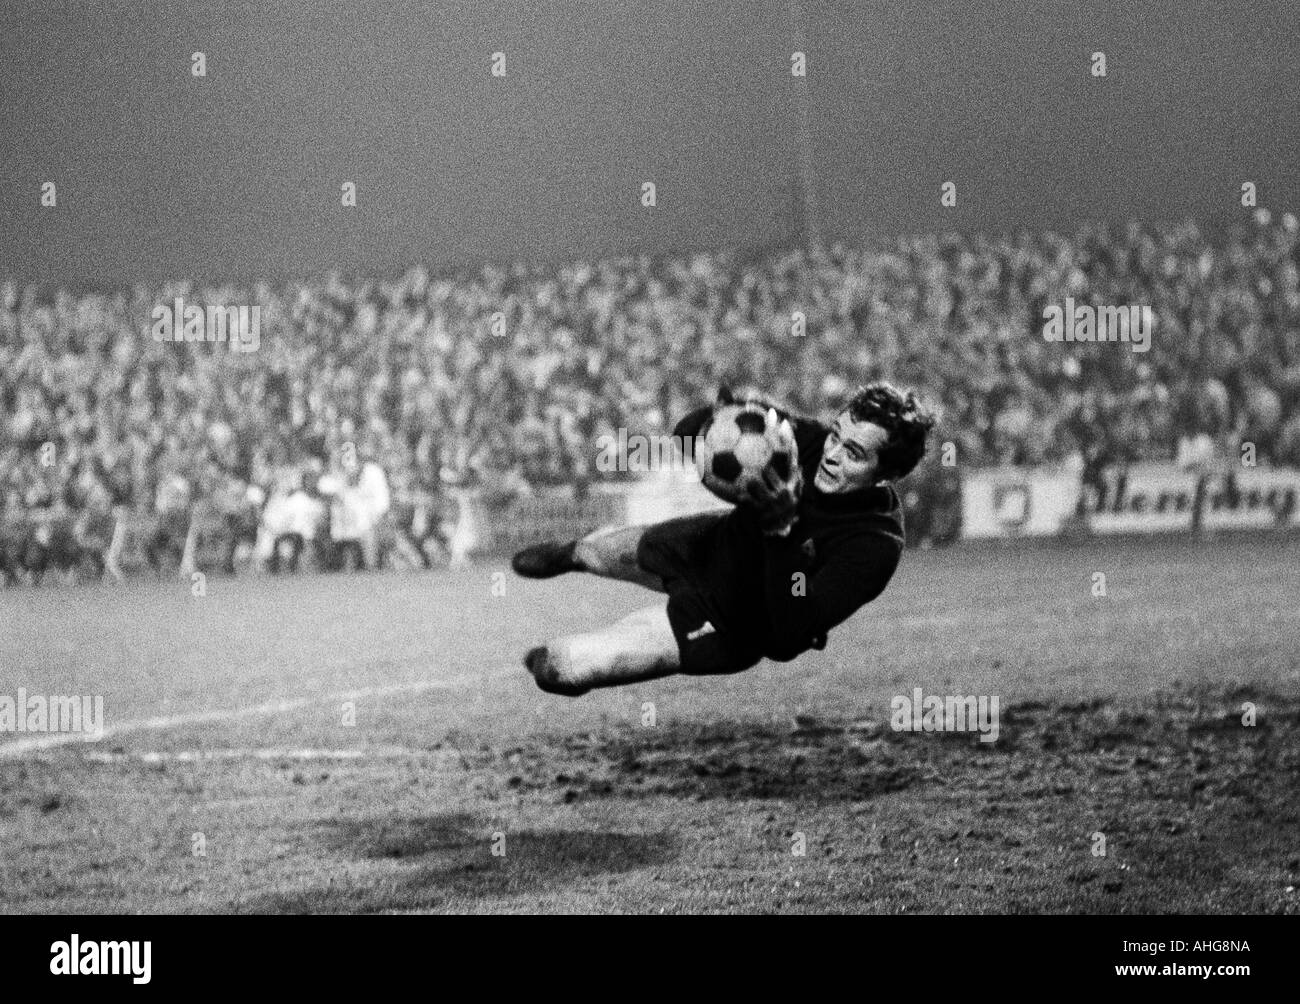 football, Bundesliga, 1969/1970, Rot-Weiss Oberhausen versus Borussia Moenchengladbach 3:4, Niederrhein Stadium in Oberhausen, scene of the match, flying save by keeper Volker Danner (Gladbach) - Stock Image